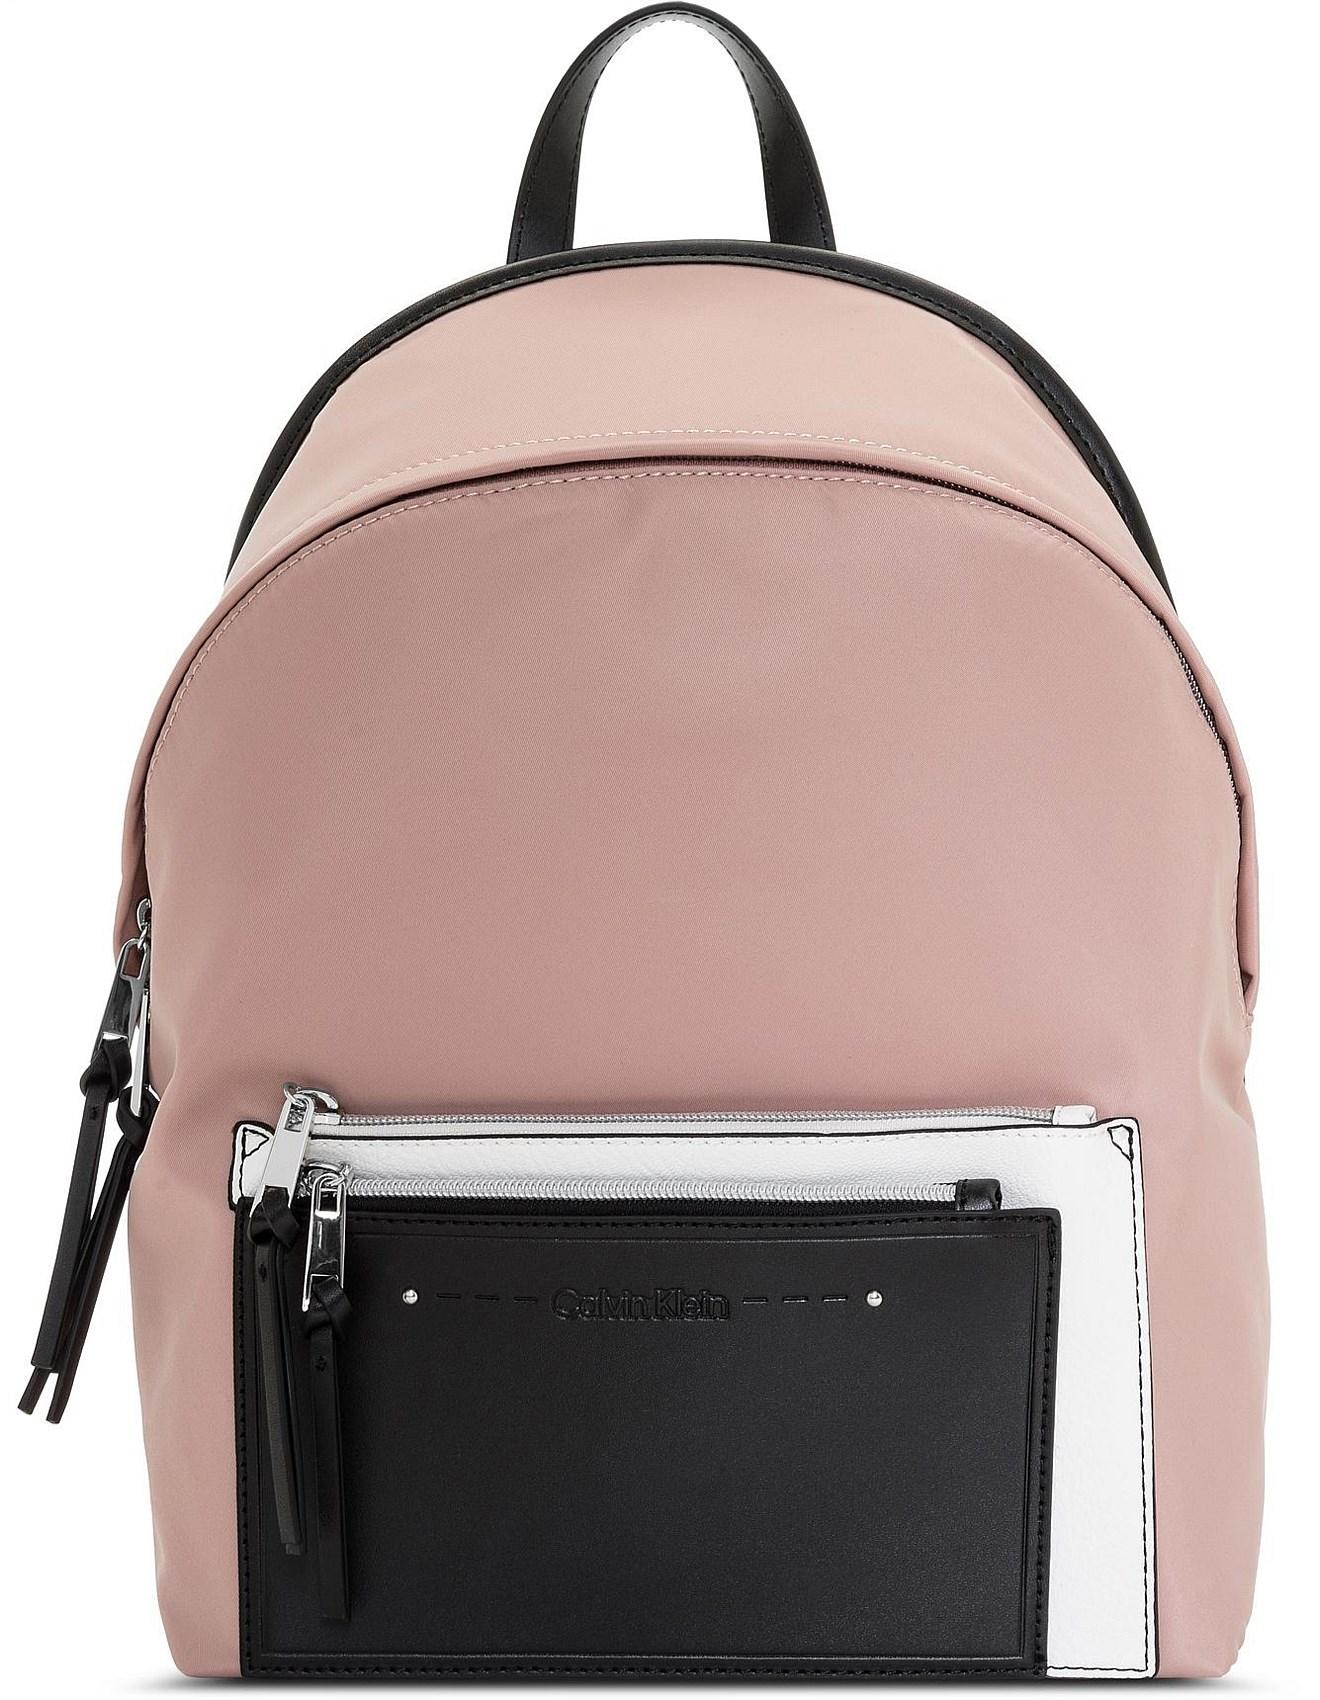 dff3a09247ba2c Calvin Klein | Buy CK Underwear, Clothing & More | David Jones ...